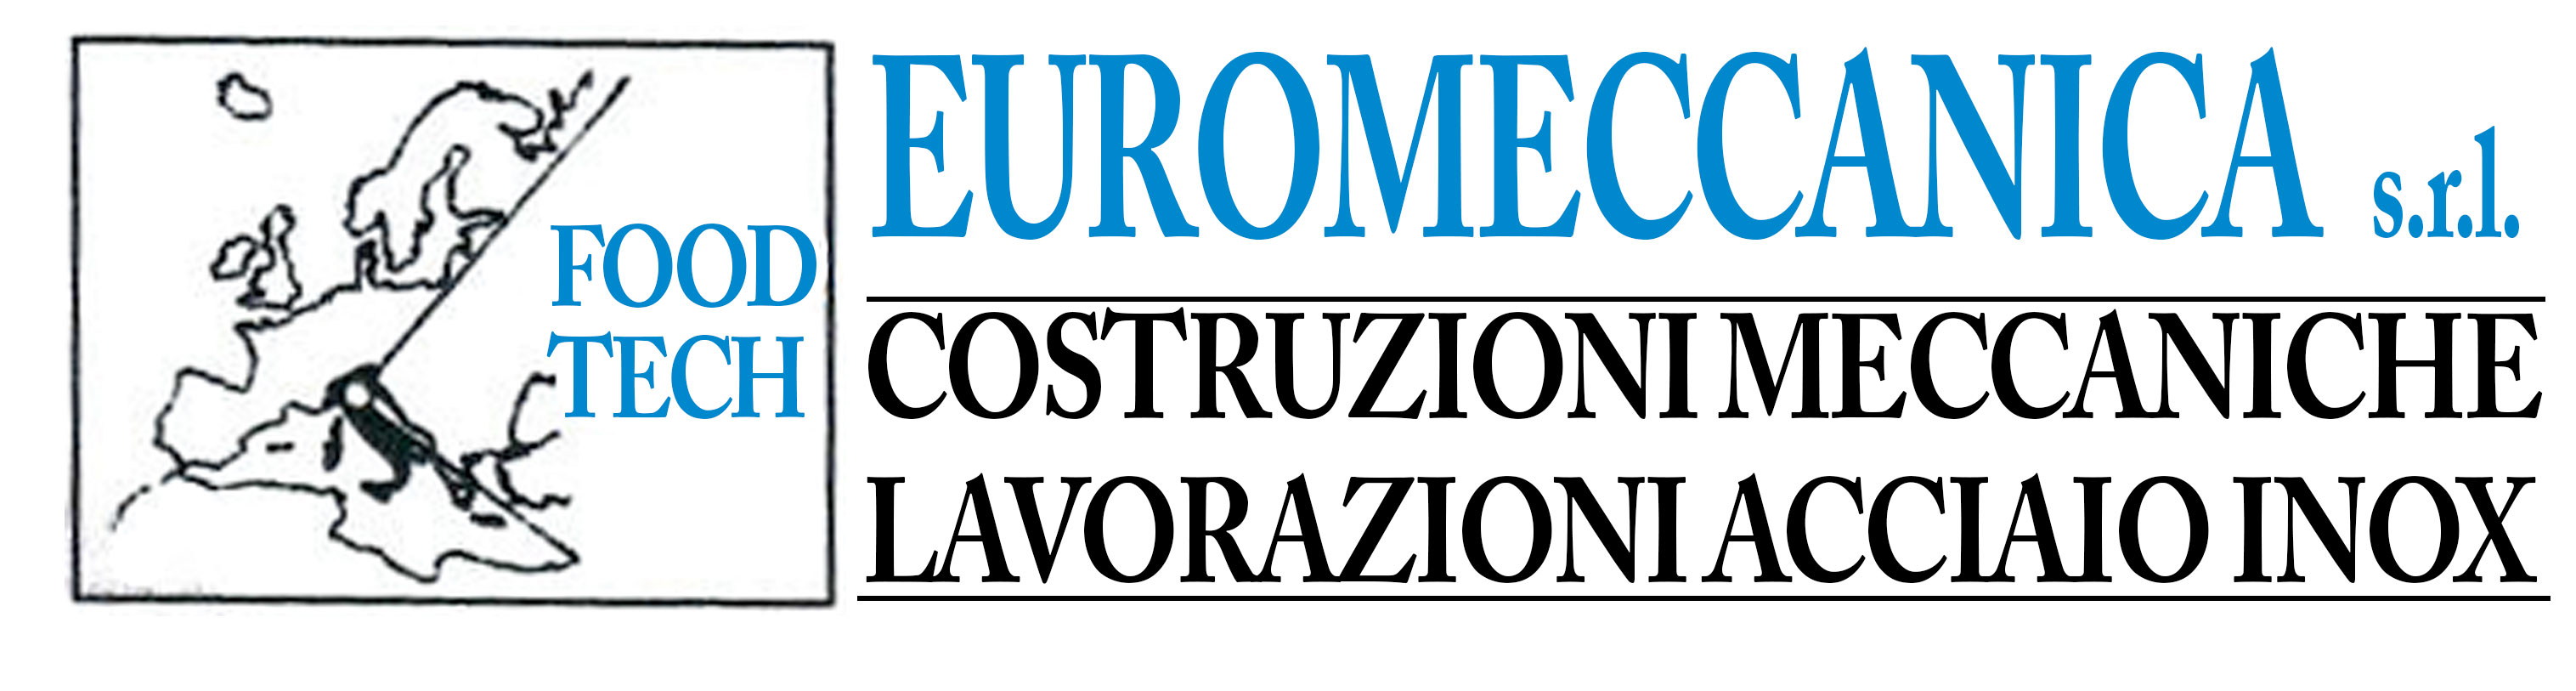 Euromeccanica Modena